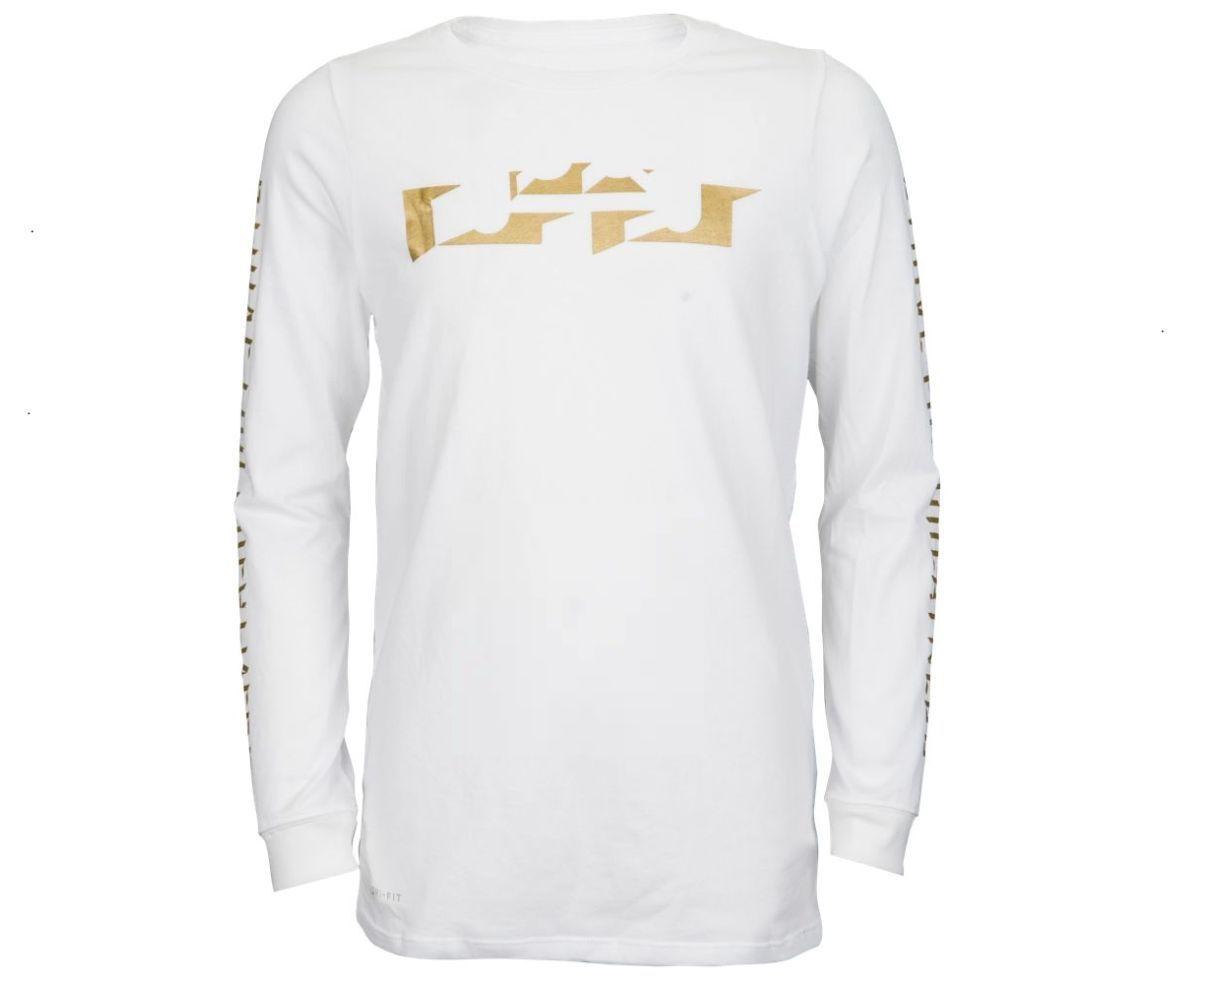 save off 8e994 1a826 Nike Boys Lebron James Long Sleeve Shirt and 26 similar items